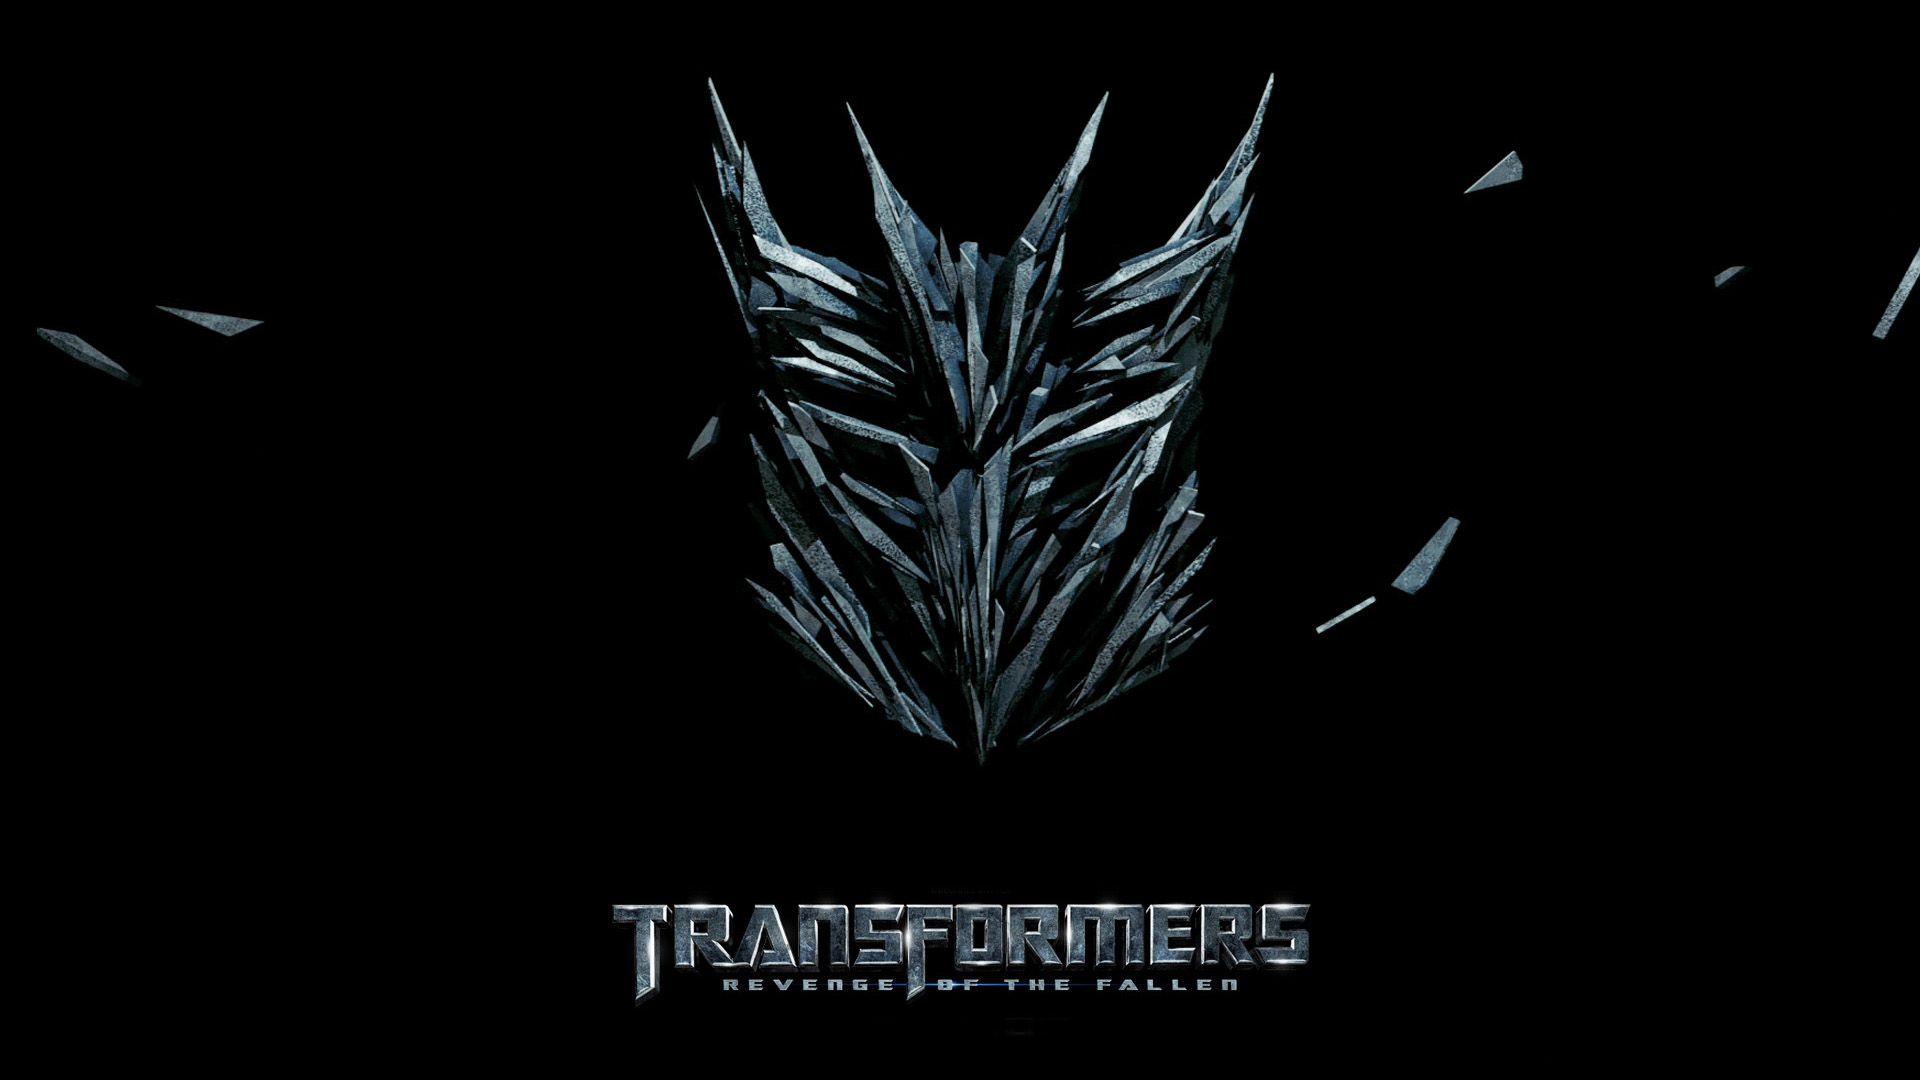 Decepticons Logo Transformers Pictures Hd Wallpaper Decepticon